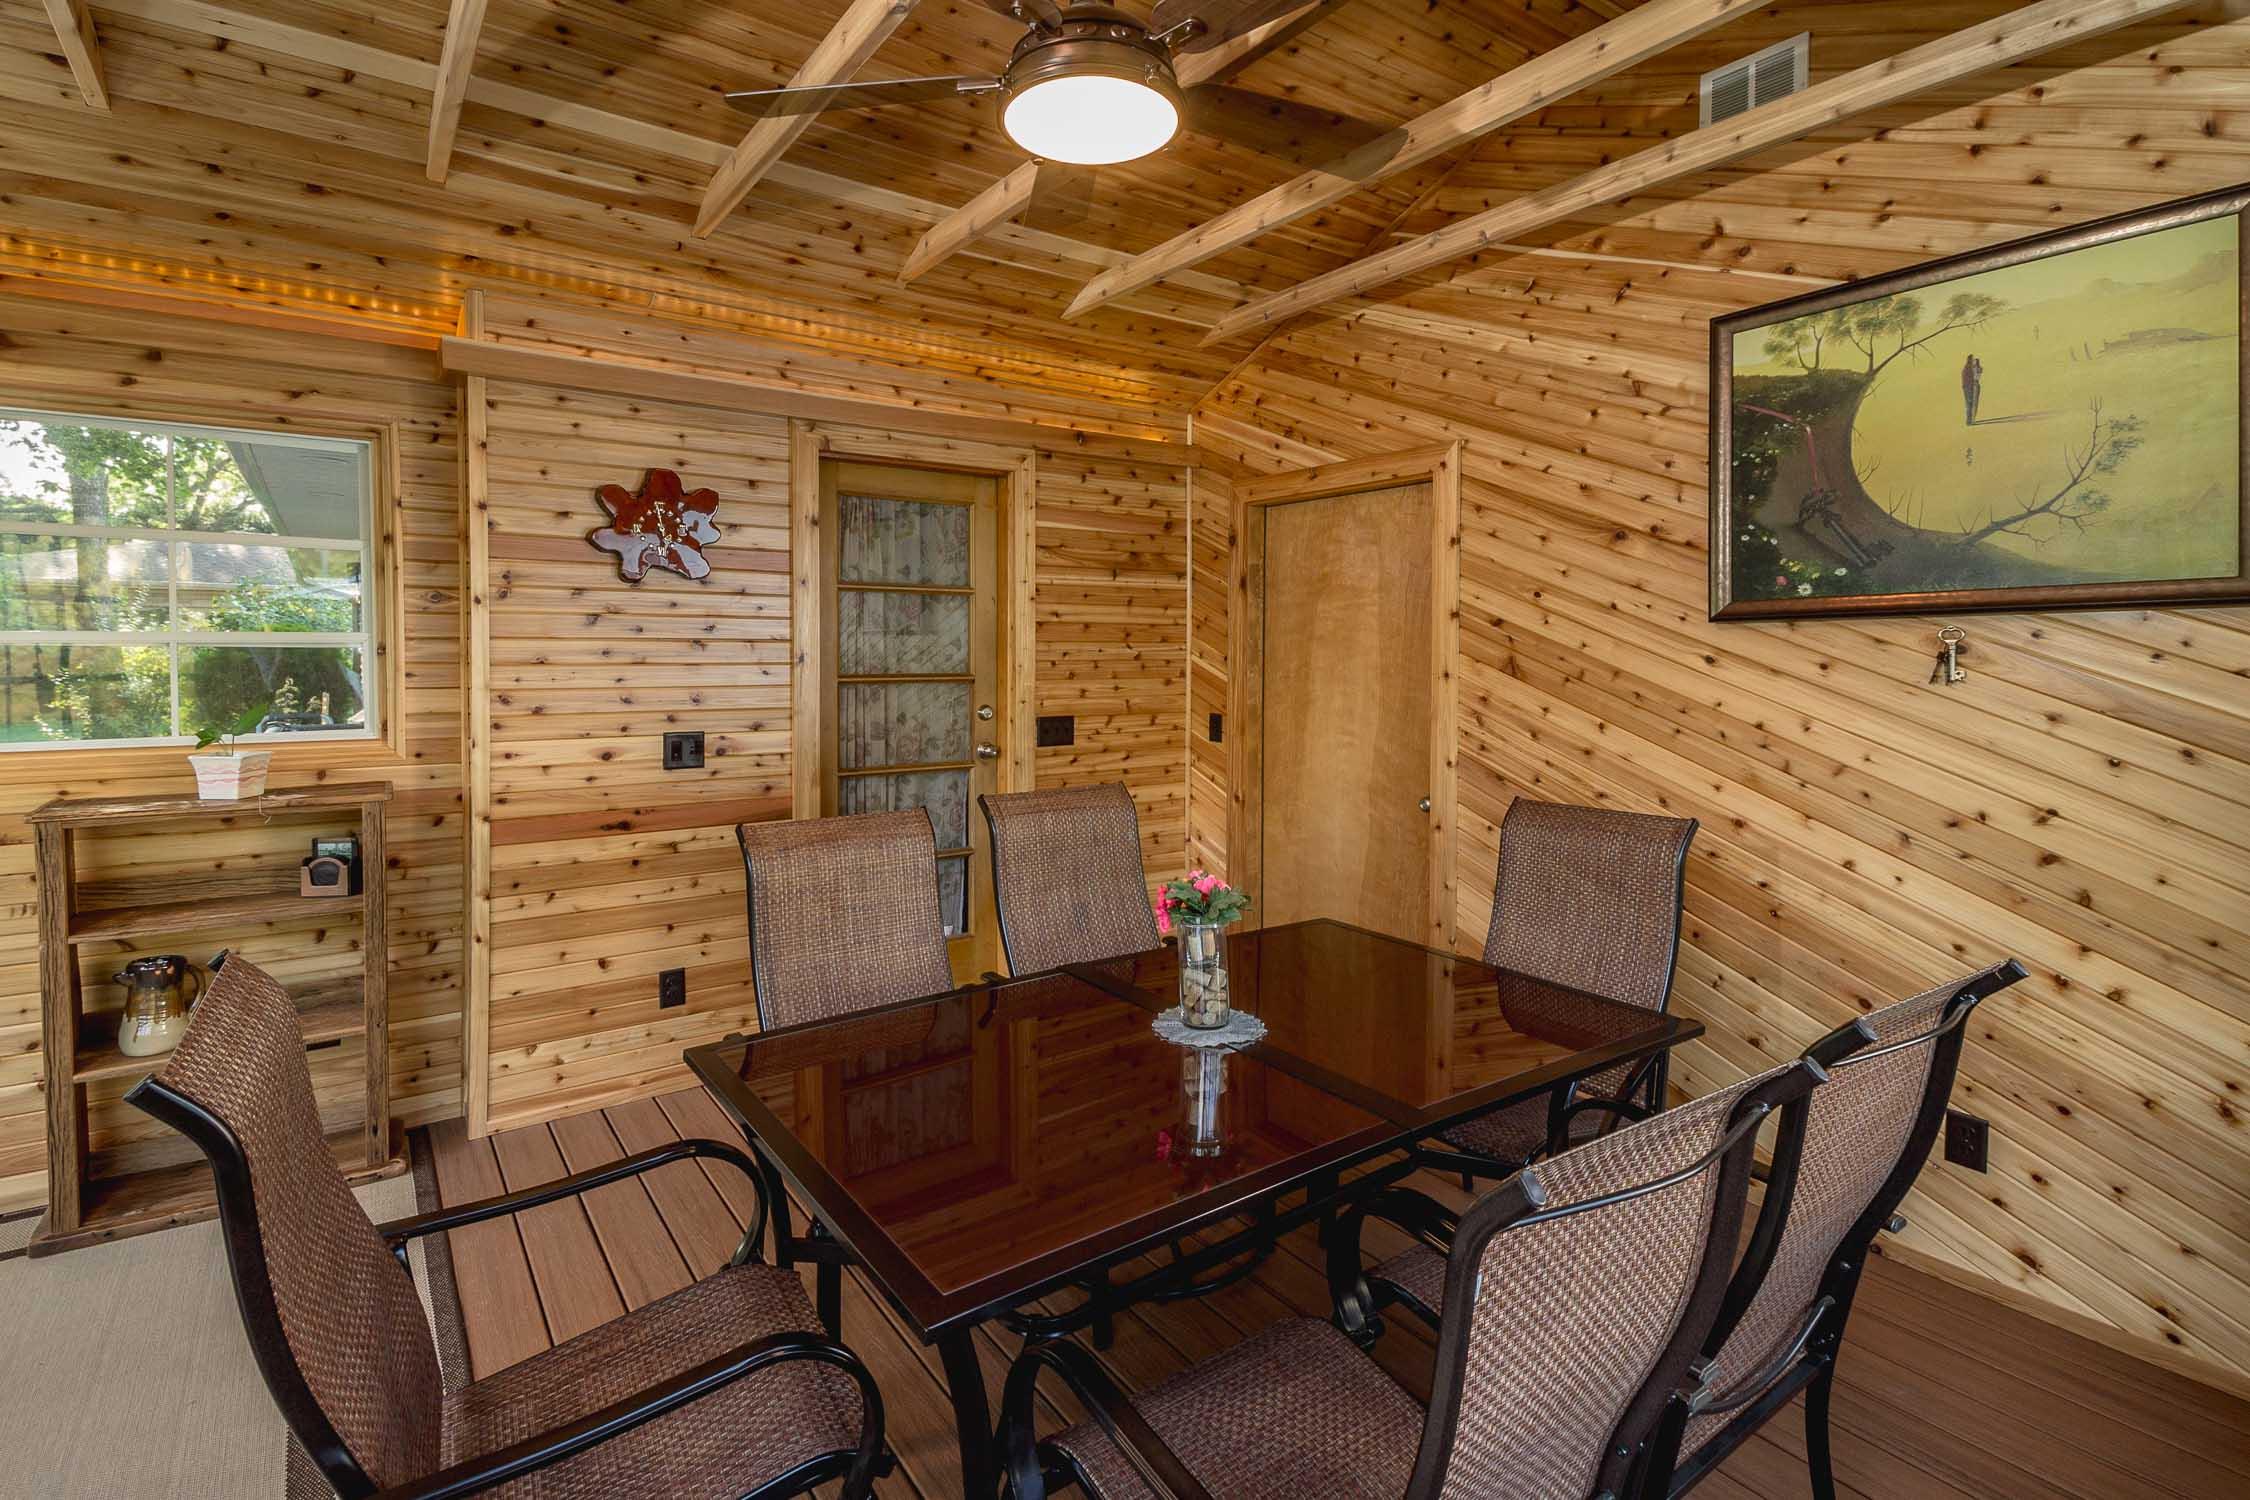 A new Three Season Porch Remodel